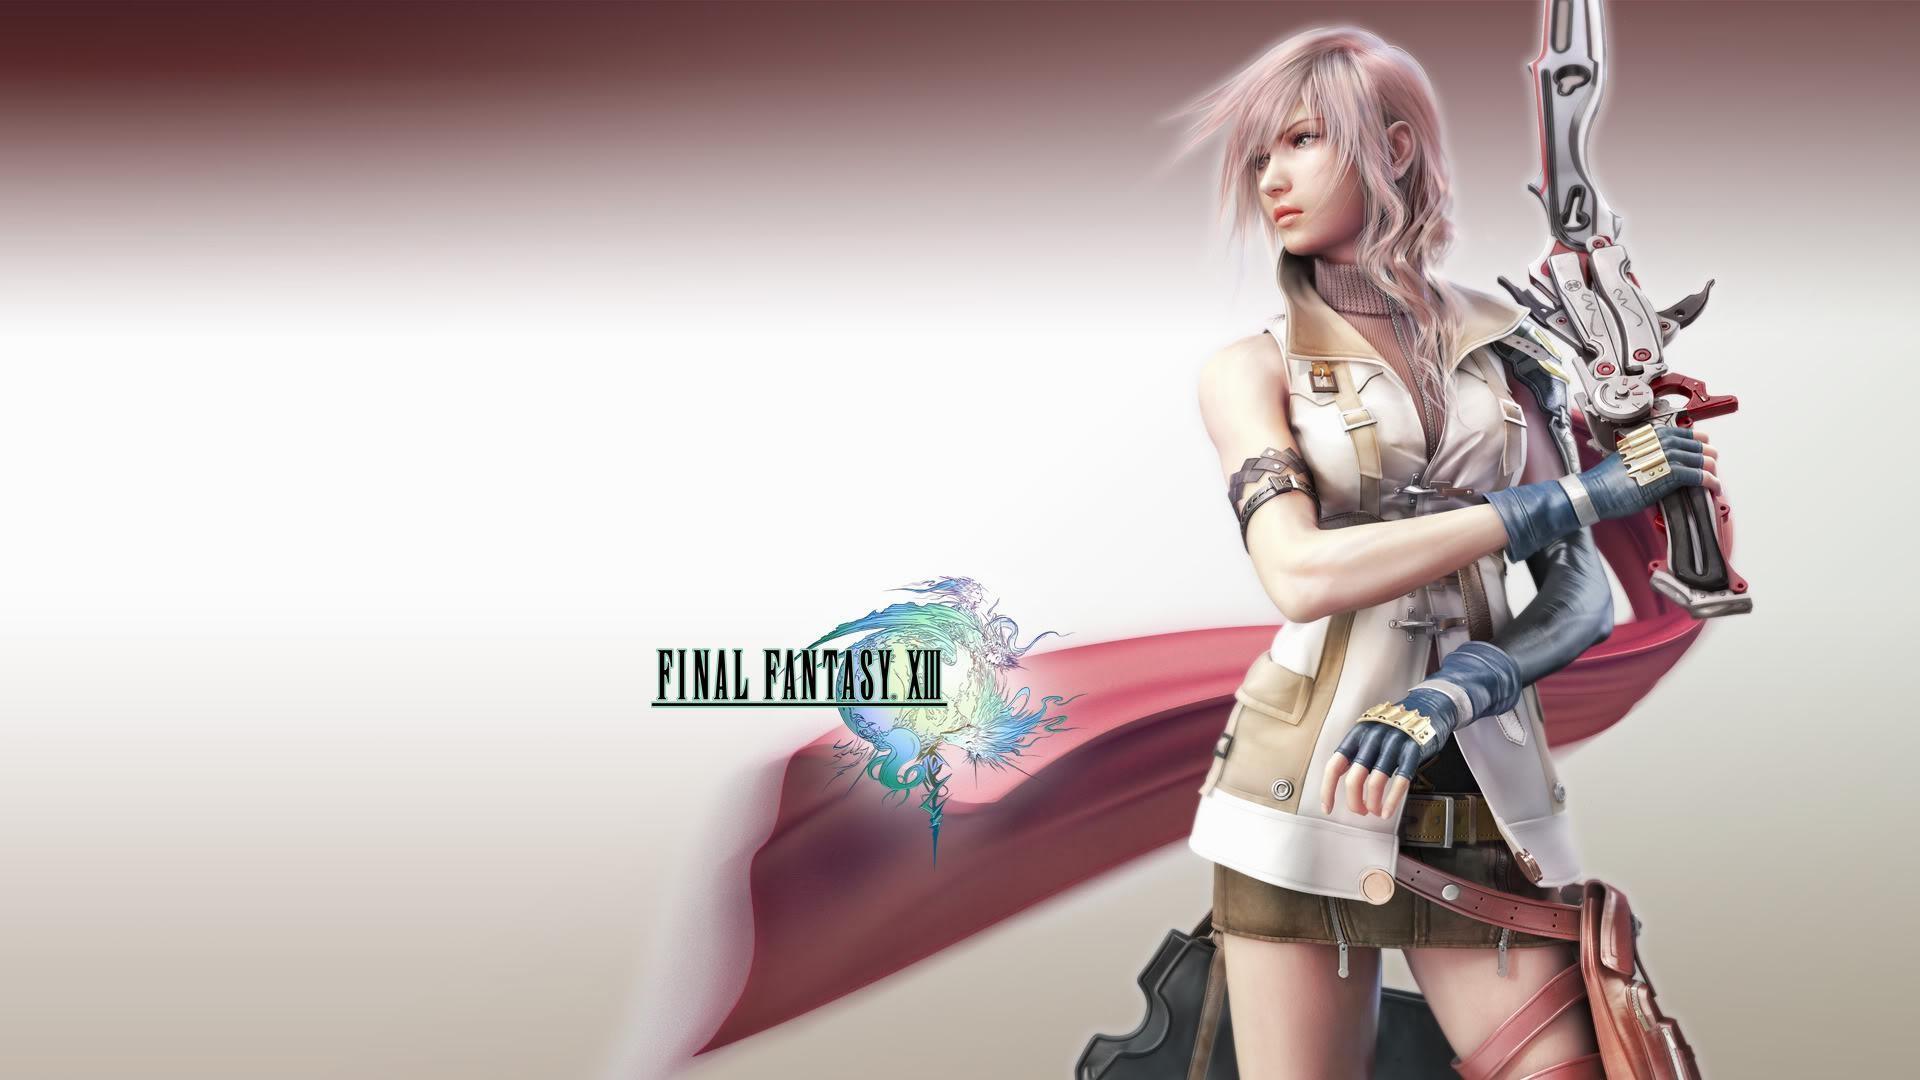 Final-fantasy-wallpapers-HD-download-desktop